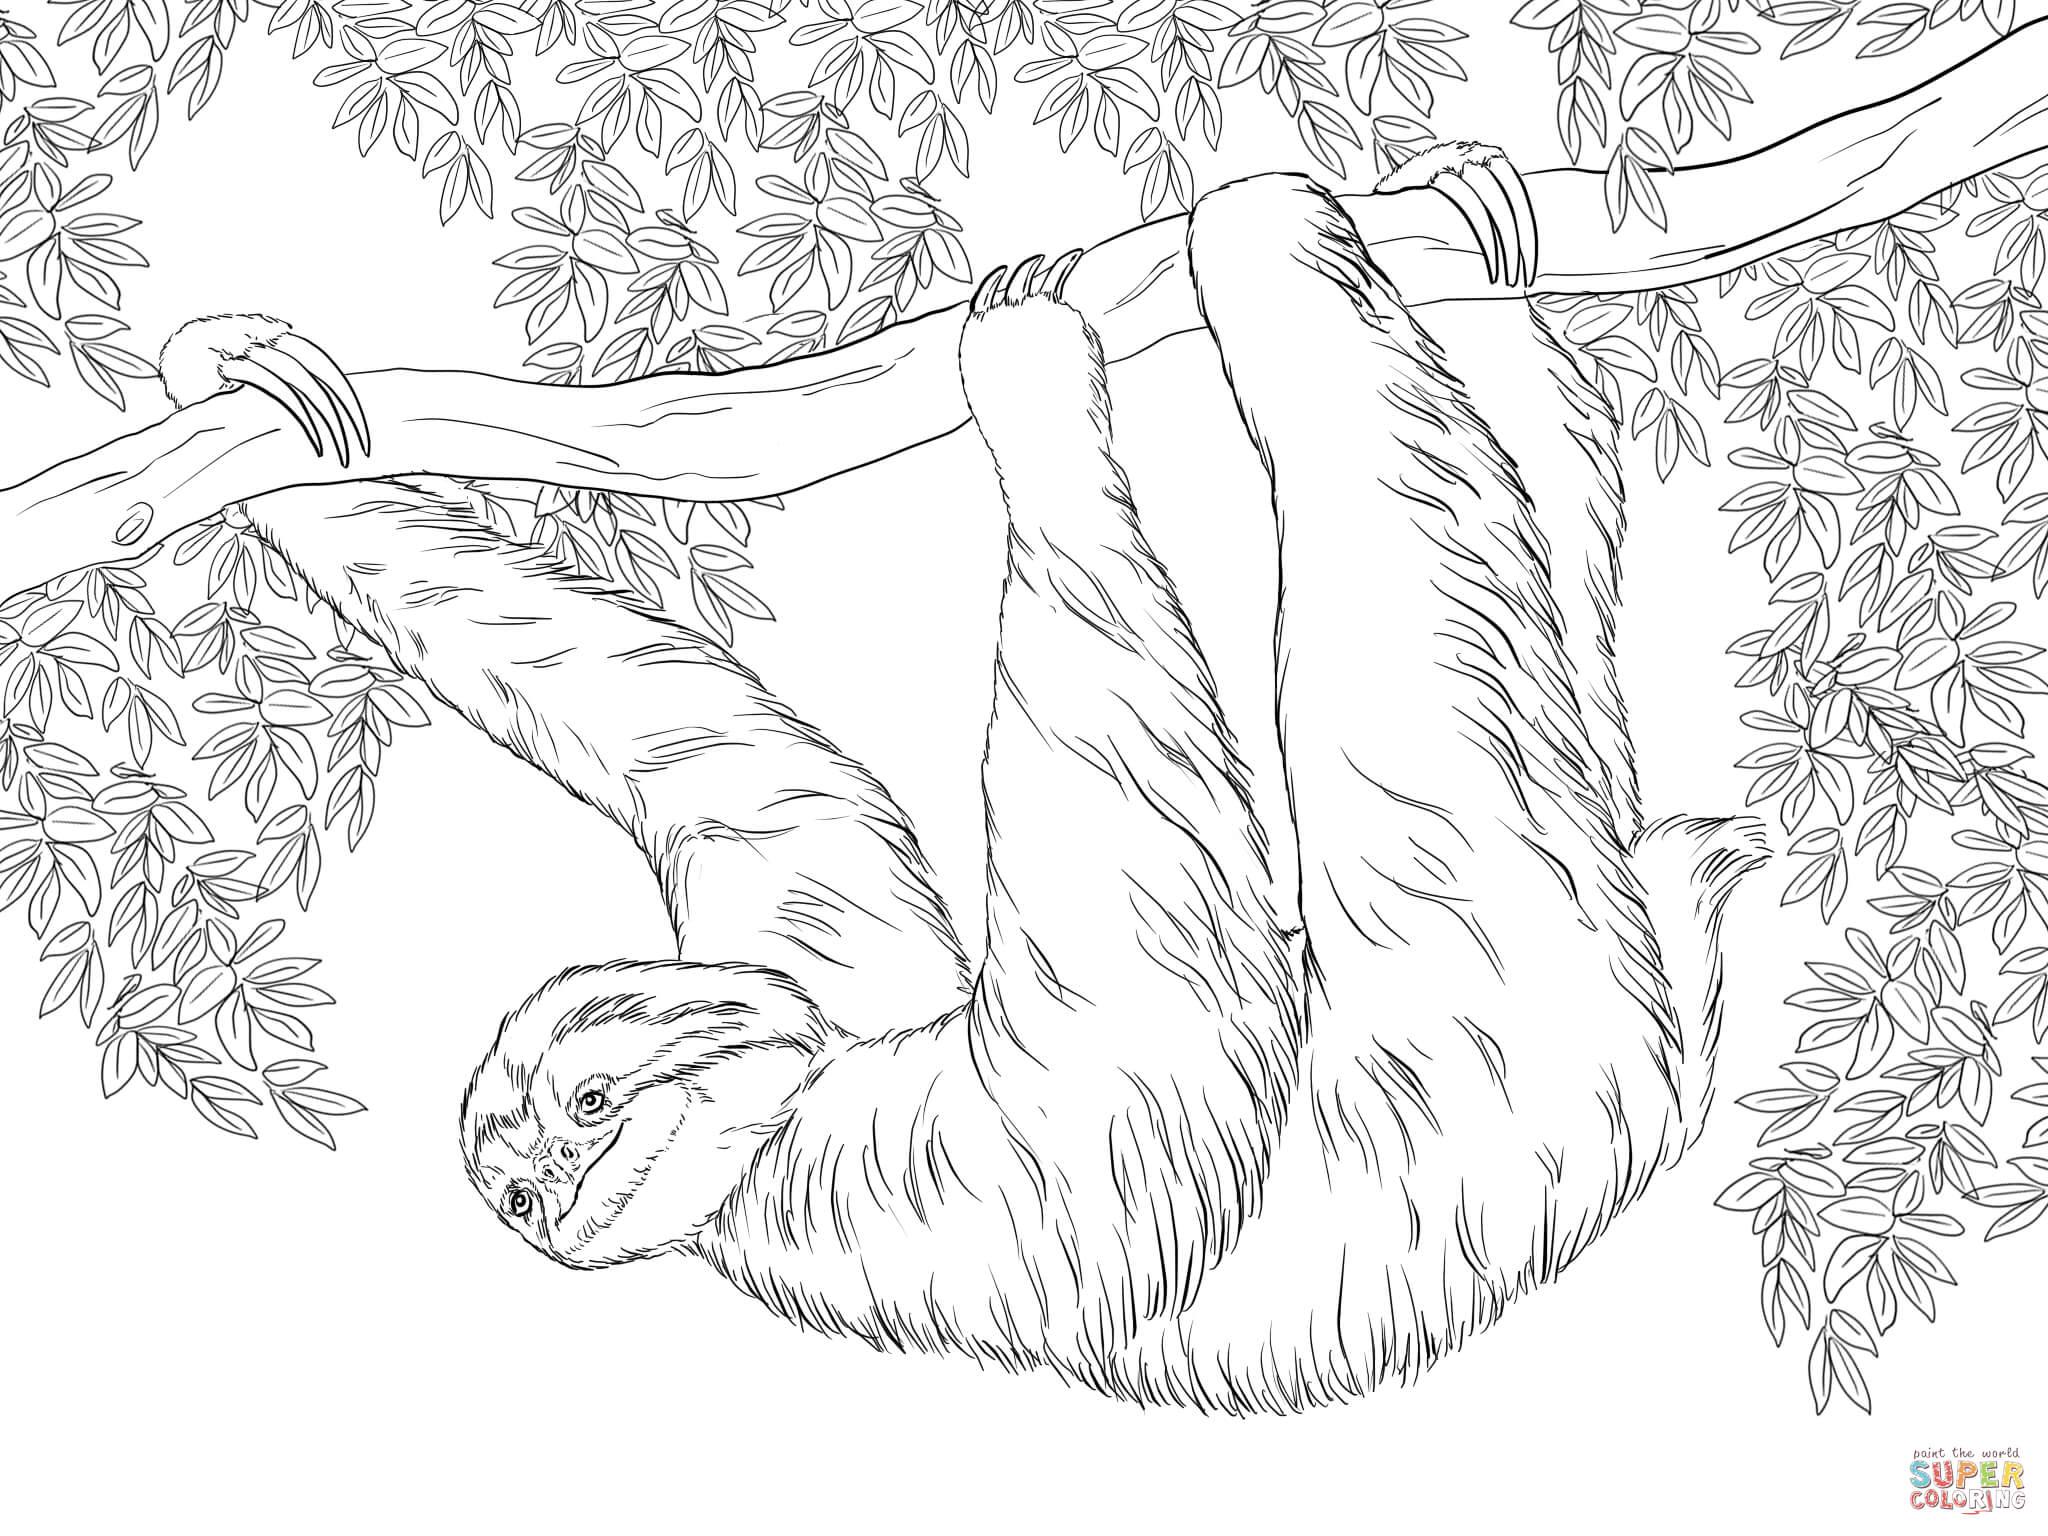 Drawn sloth hanging on tree Three Printable the Click Three